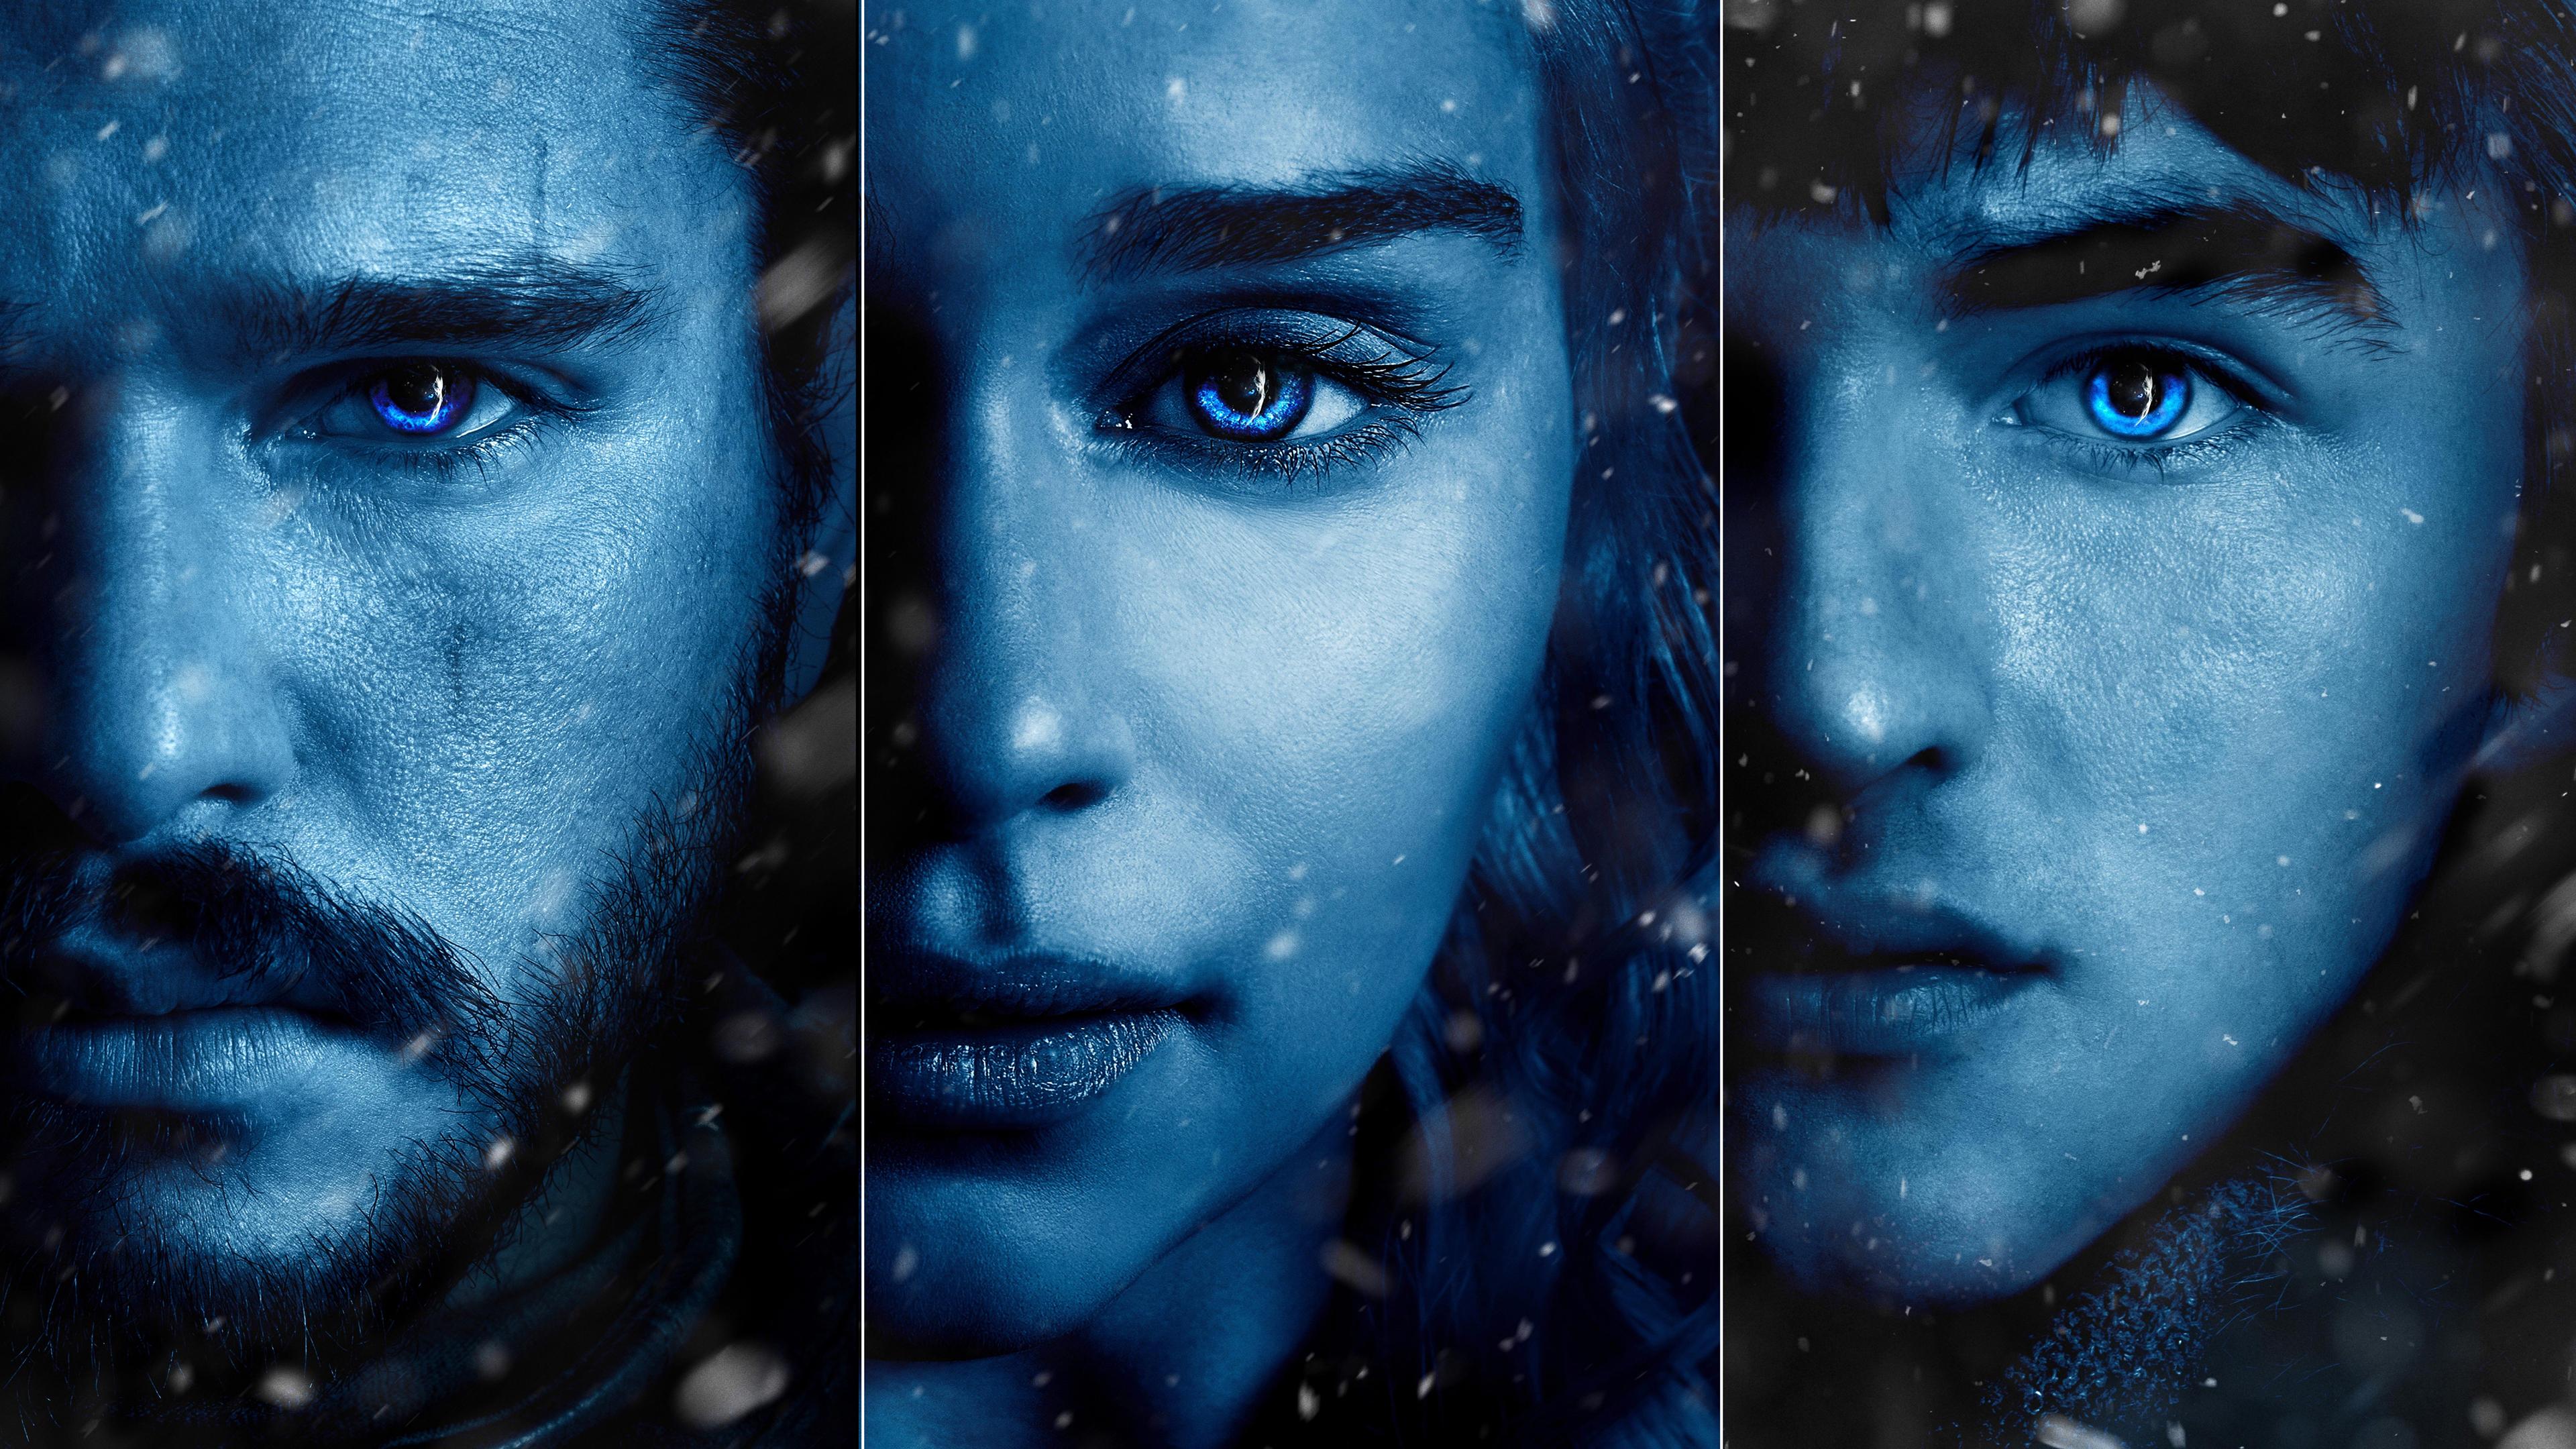 Jon Snow Ps4wallpapers Com